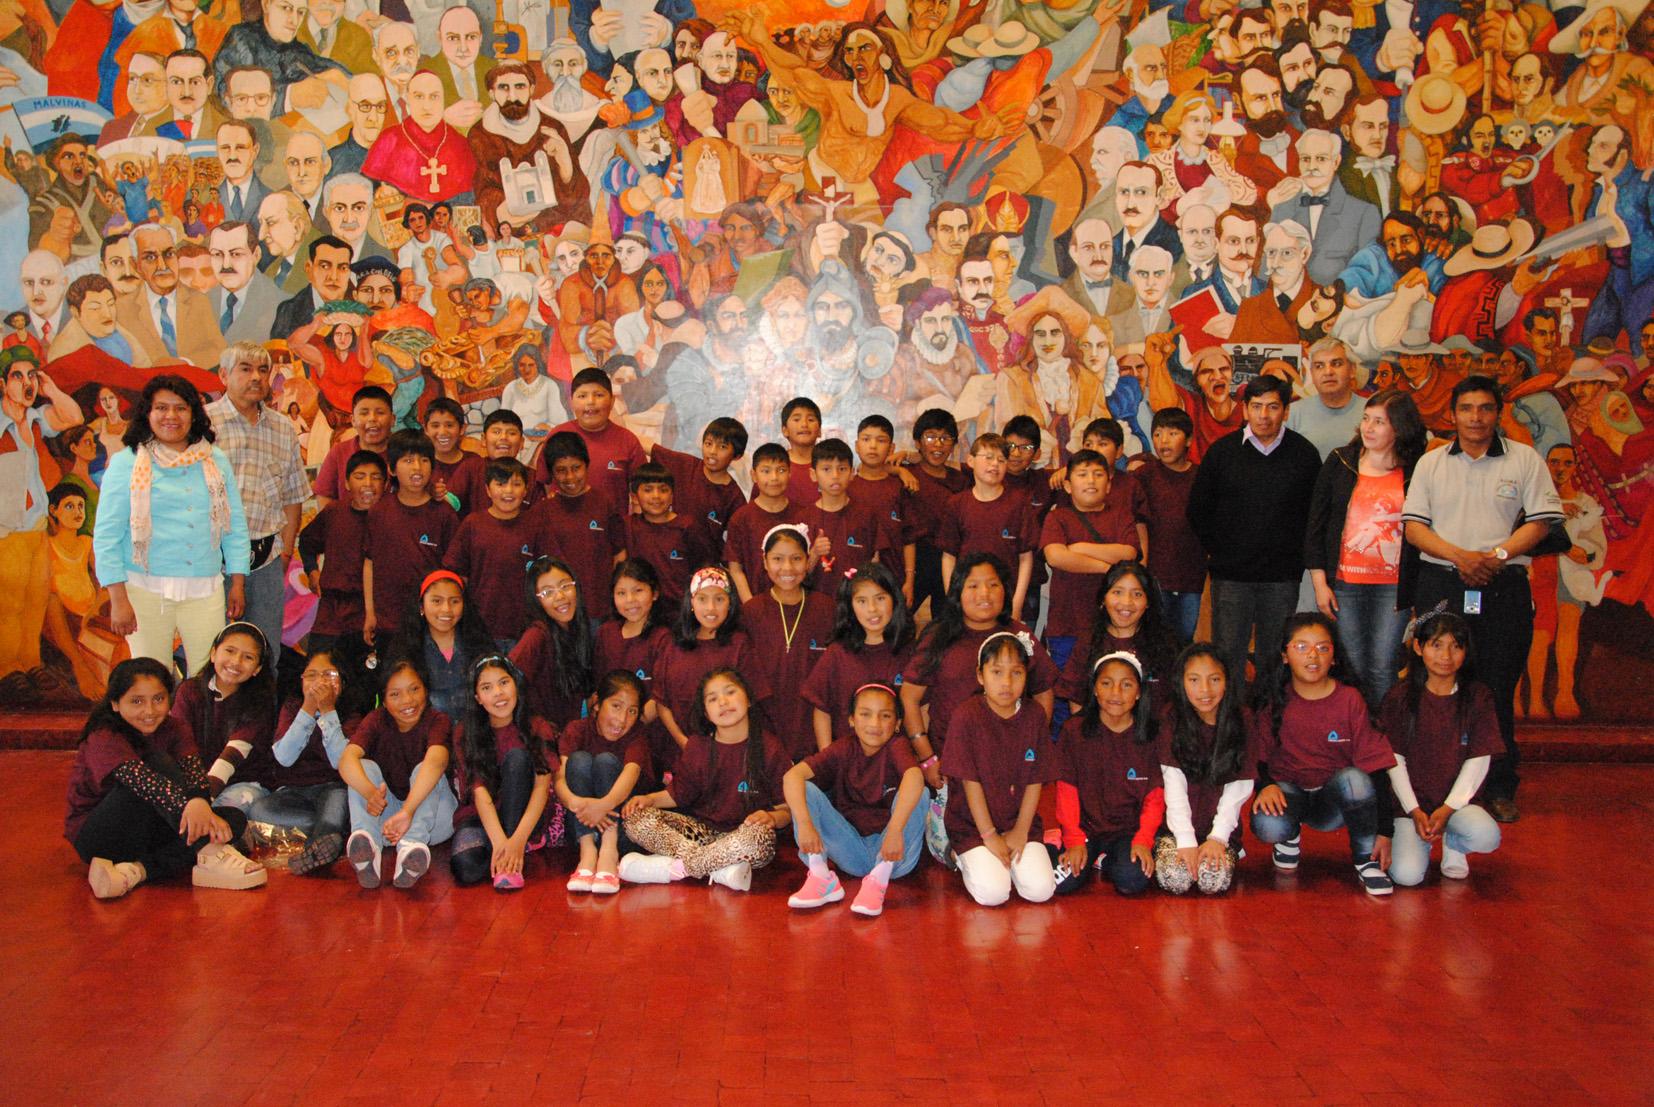 Niños de Mina Aguilar visitaron la legislatura de Jujuy